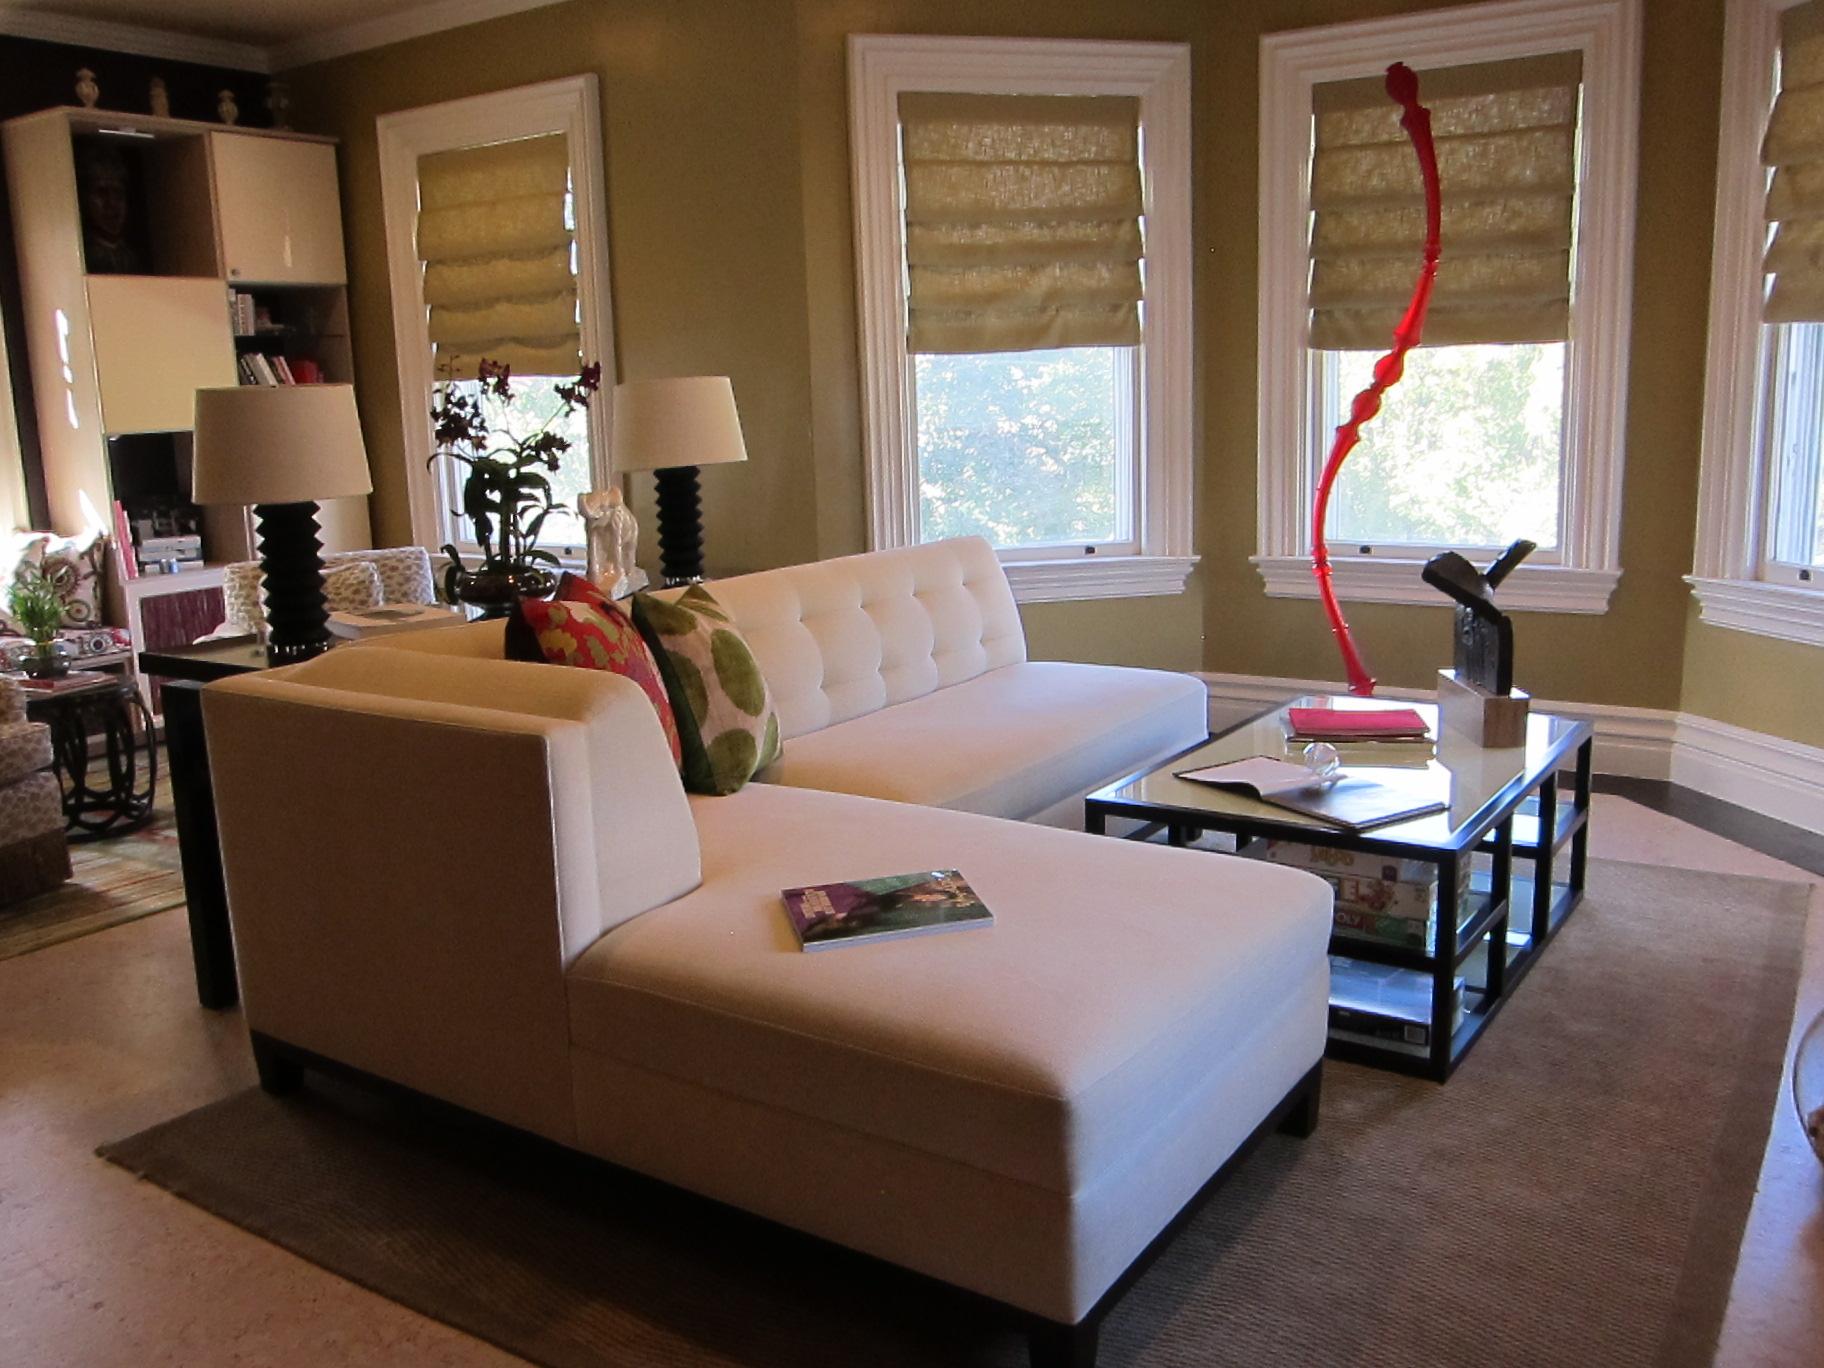 Suzanne Logan - Family Room, JLB Show House 2012